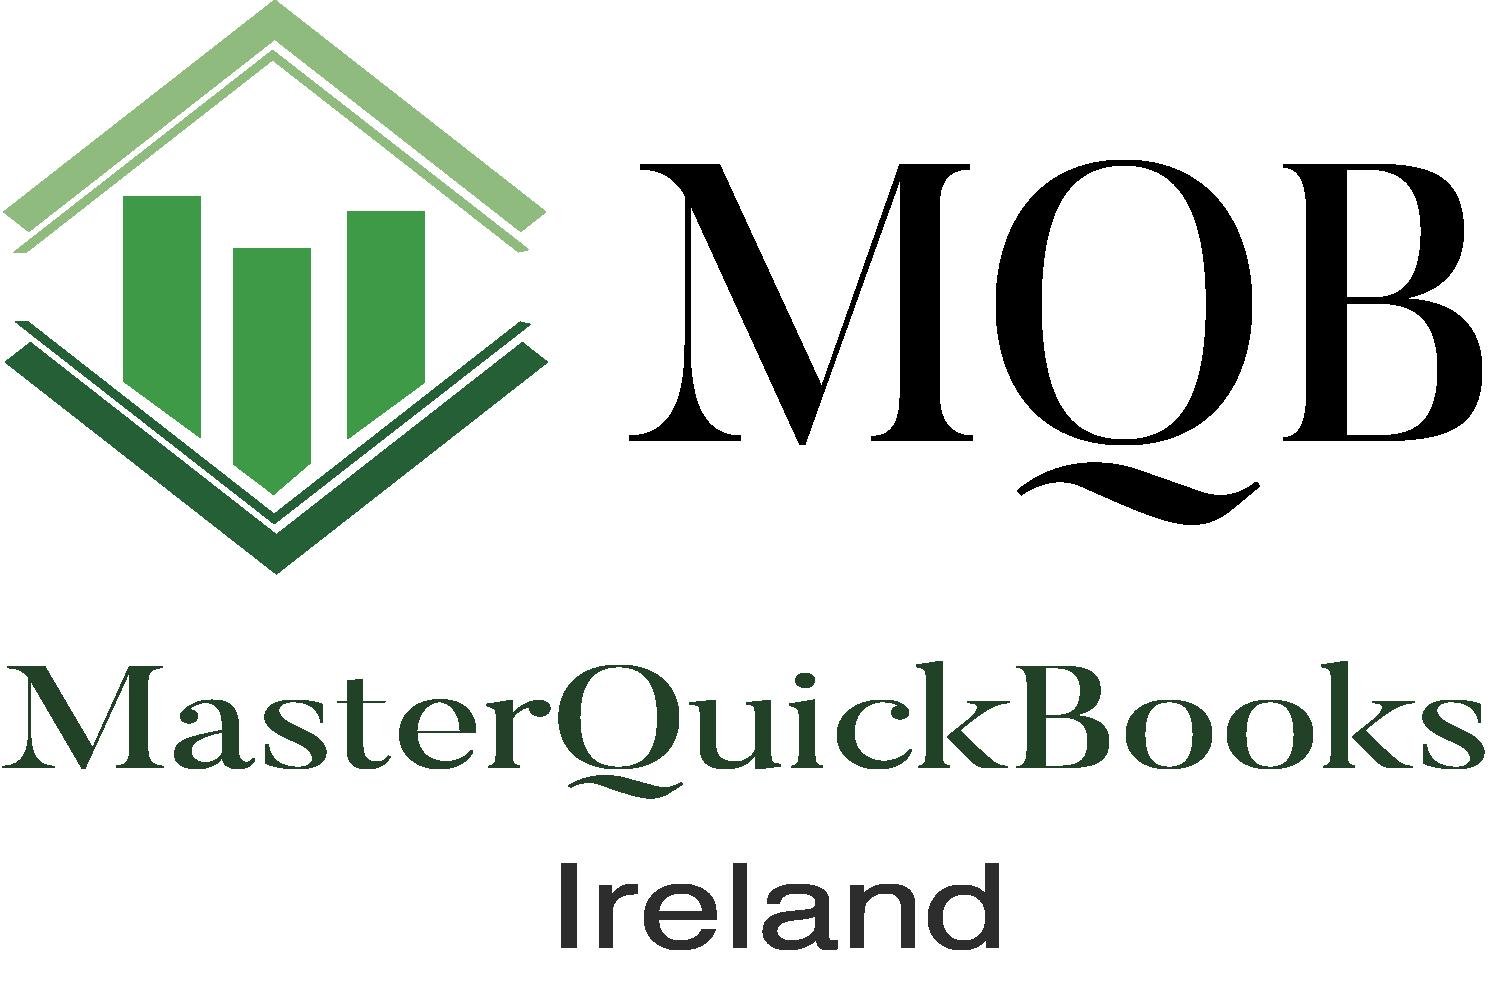 Master QuickBooks Ireland | Certified QuickBooks Advisor